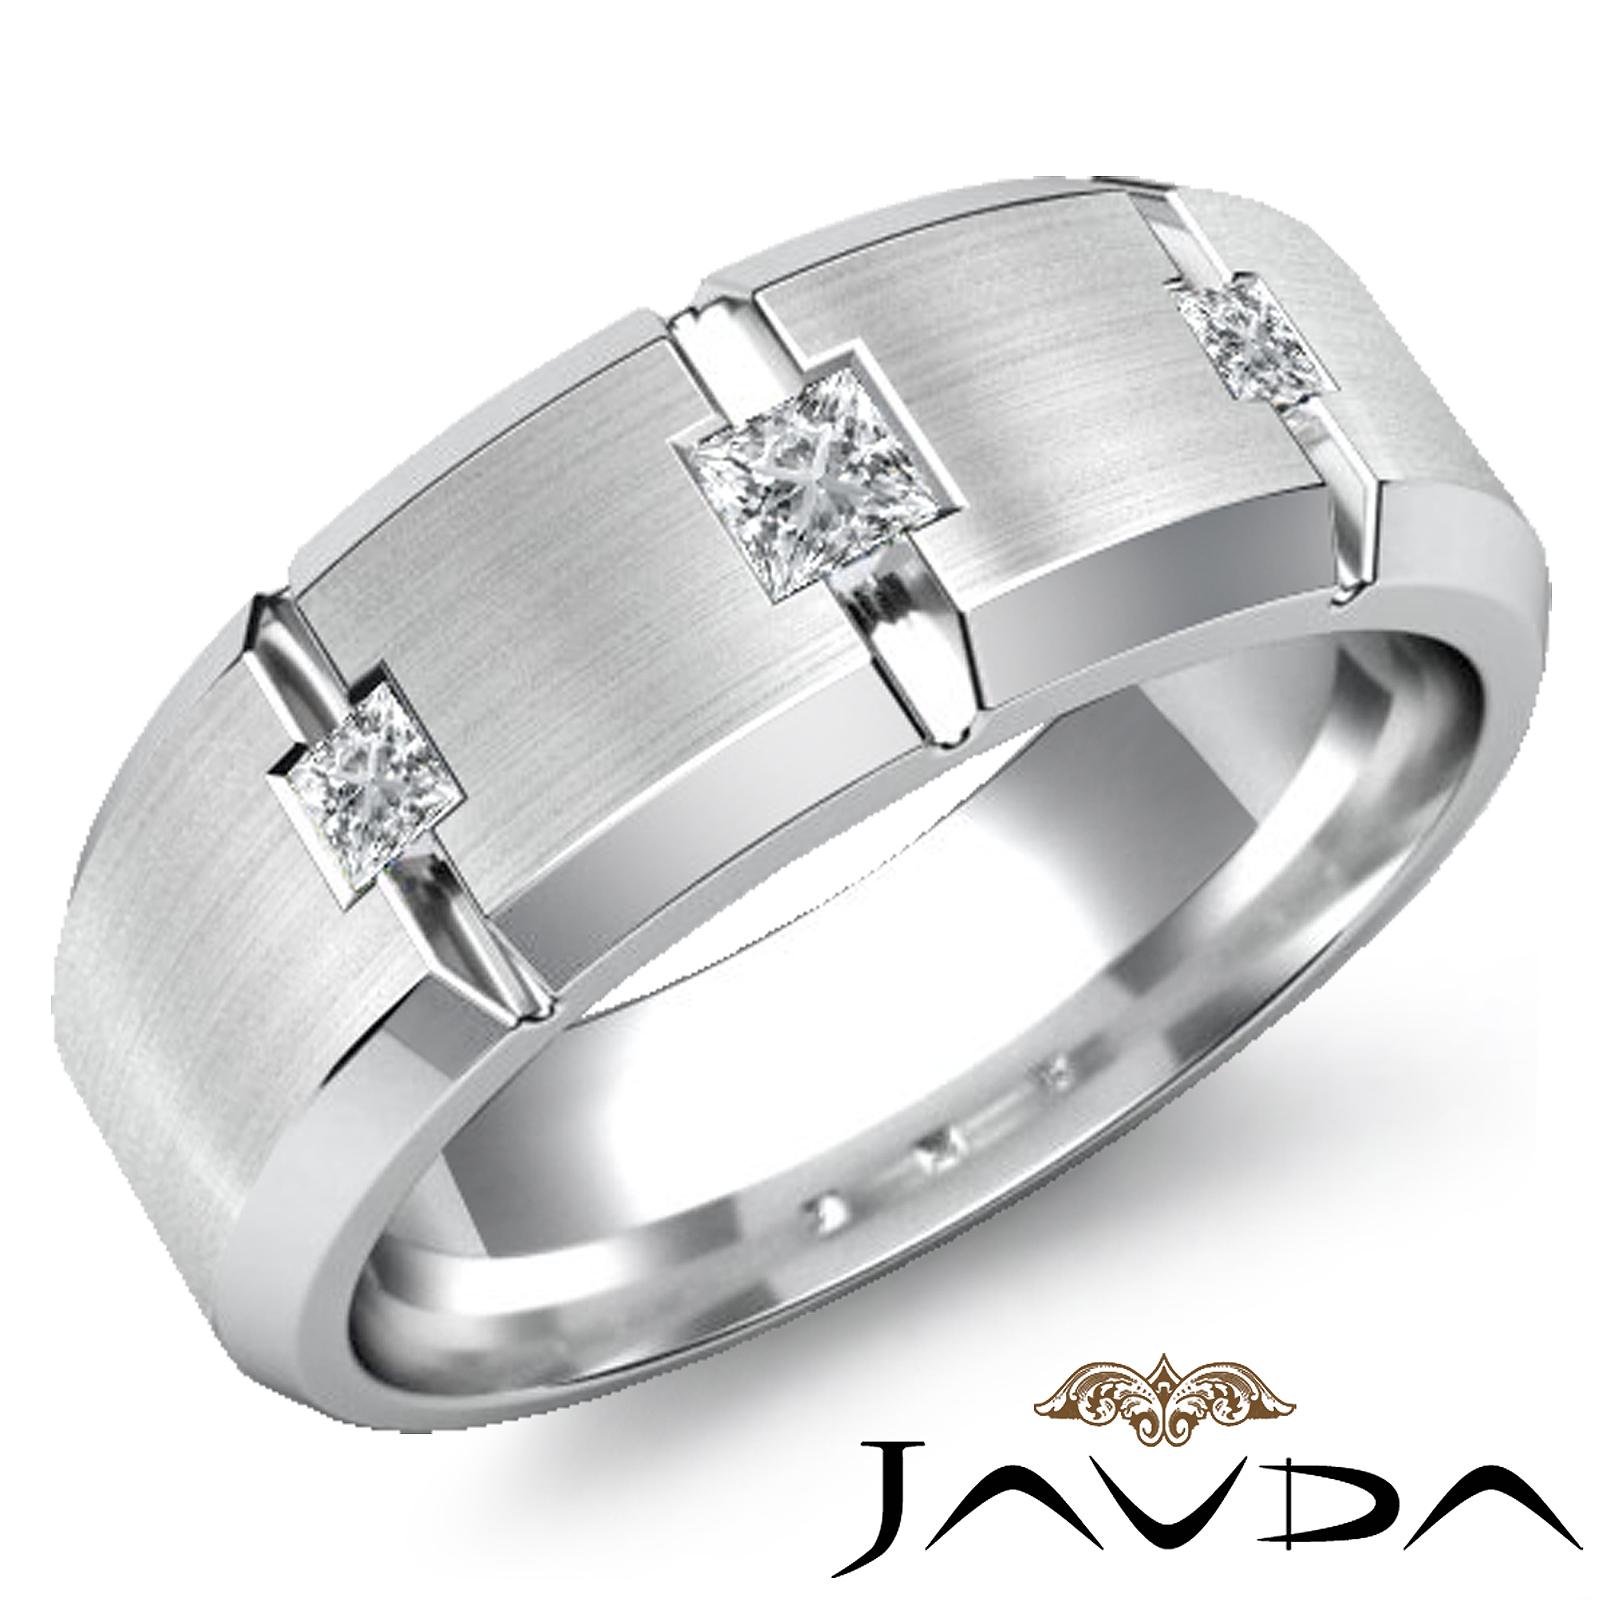 Bezel 3 Stone Diamond Bevel Edge Mens Half Wedding Band